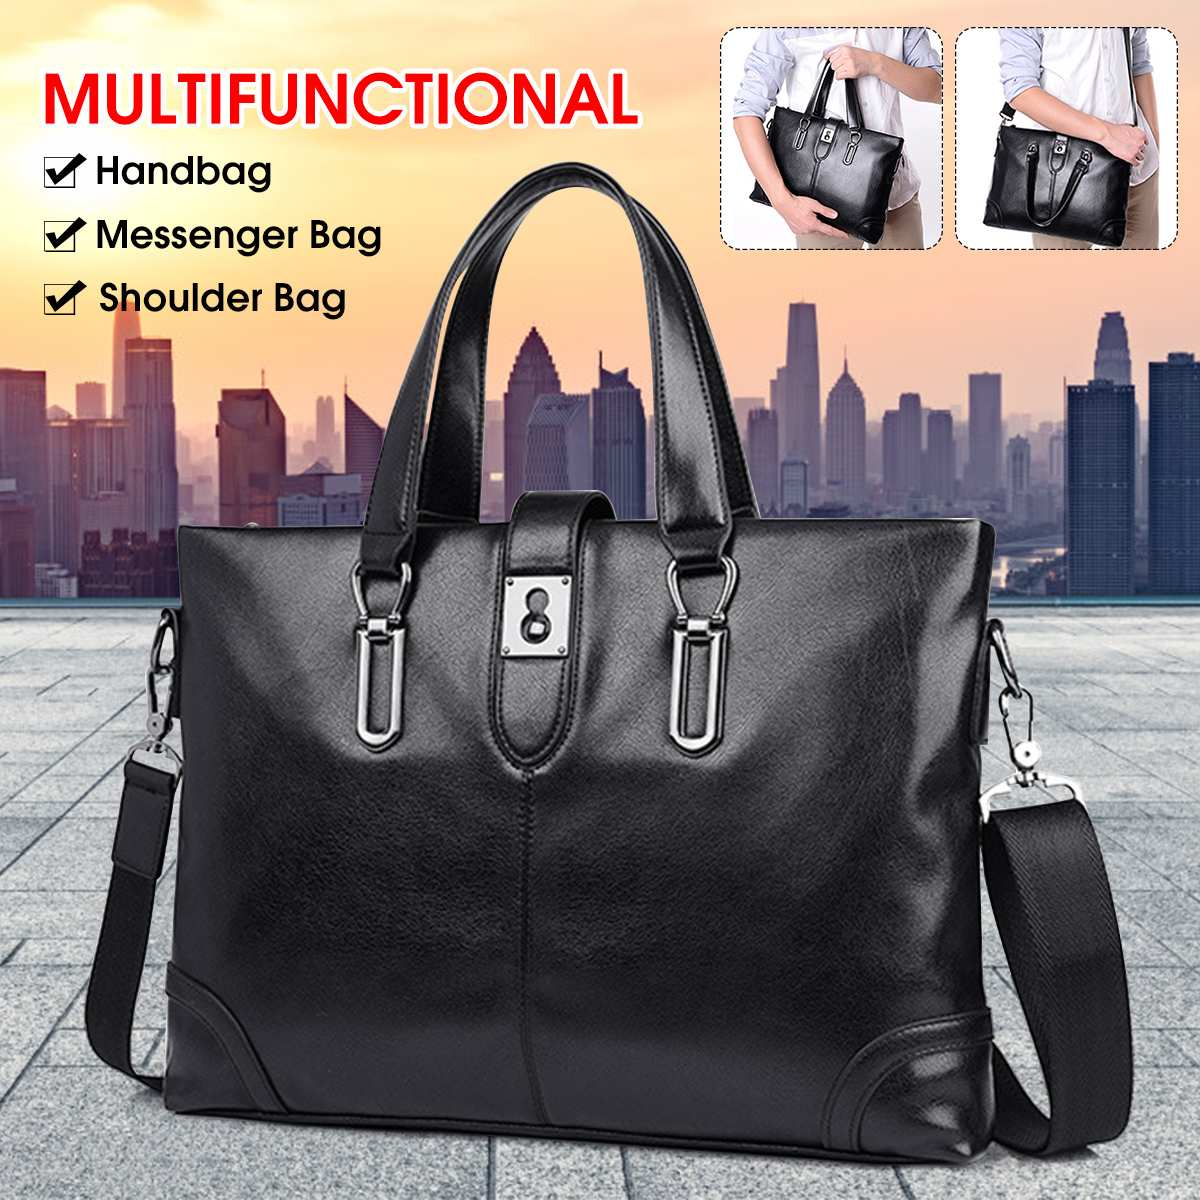 Retro Men PU Leather Black Briefcase Business Handbags Messenger Bags Male Vintage Shoulder Bag Large Capacity Laptop Bag